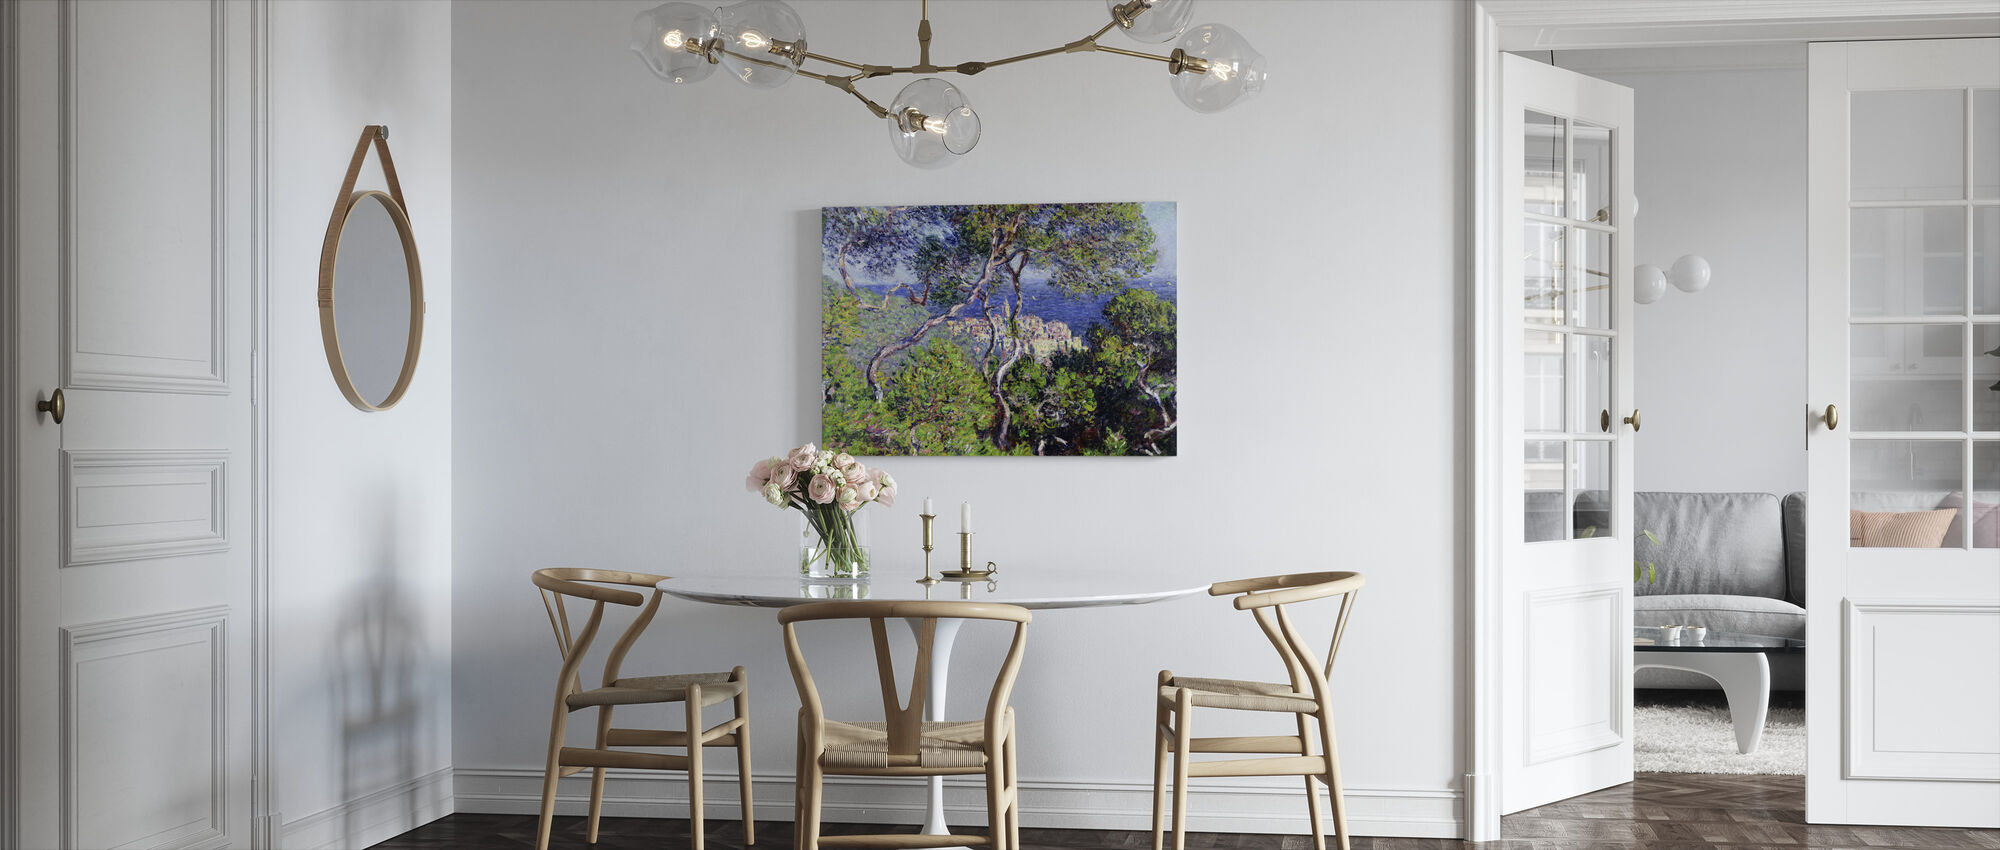 Bordighera -  Claude Monet - Canvastavla - Kök